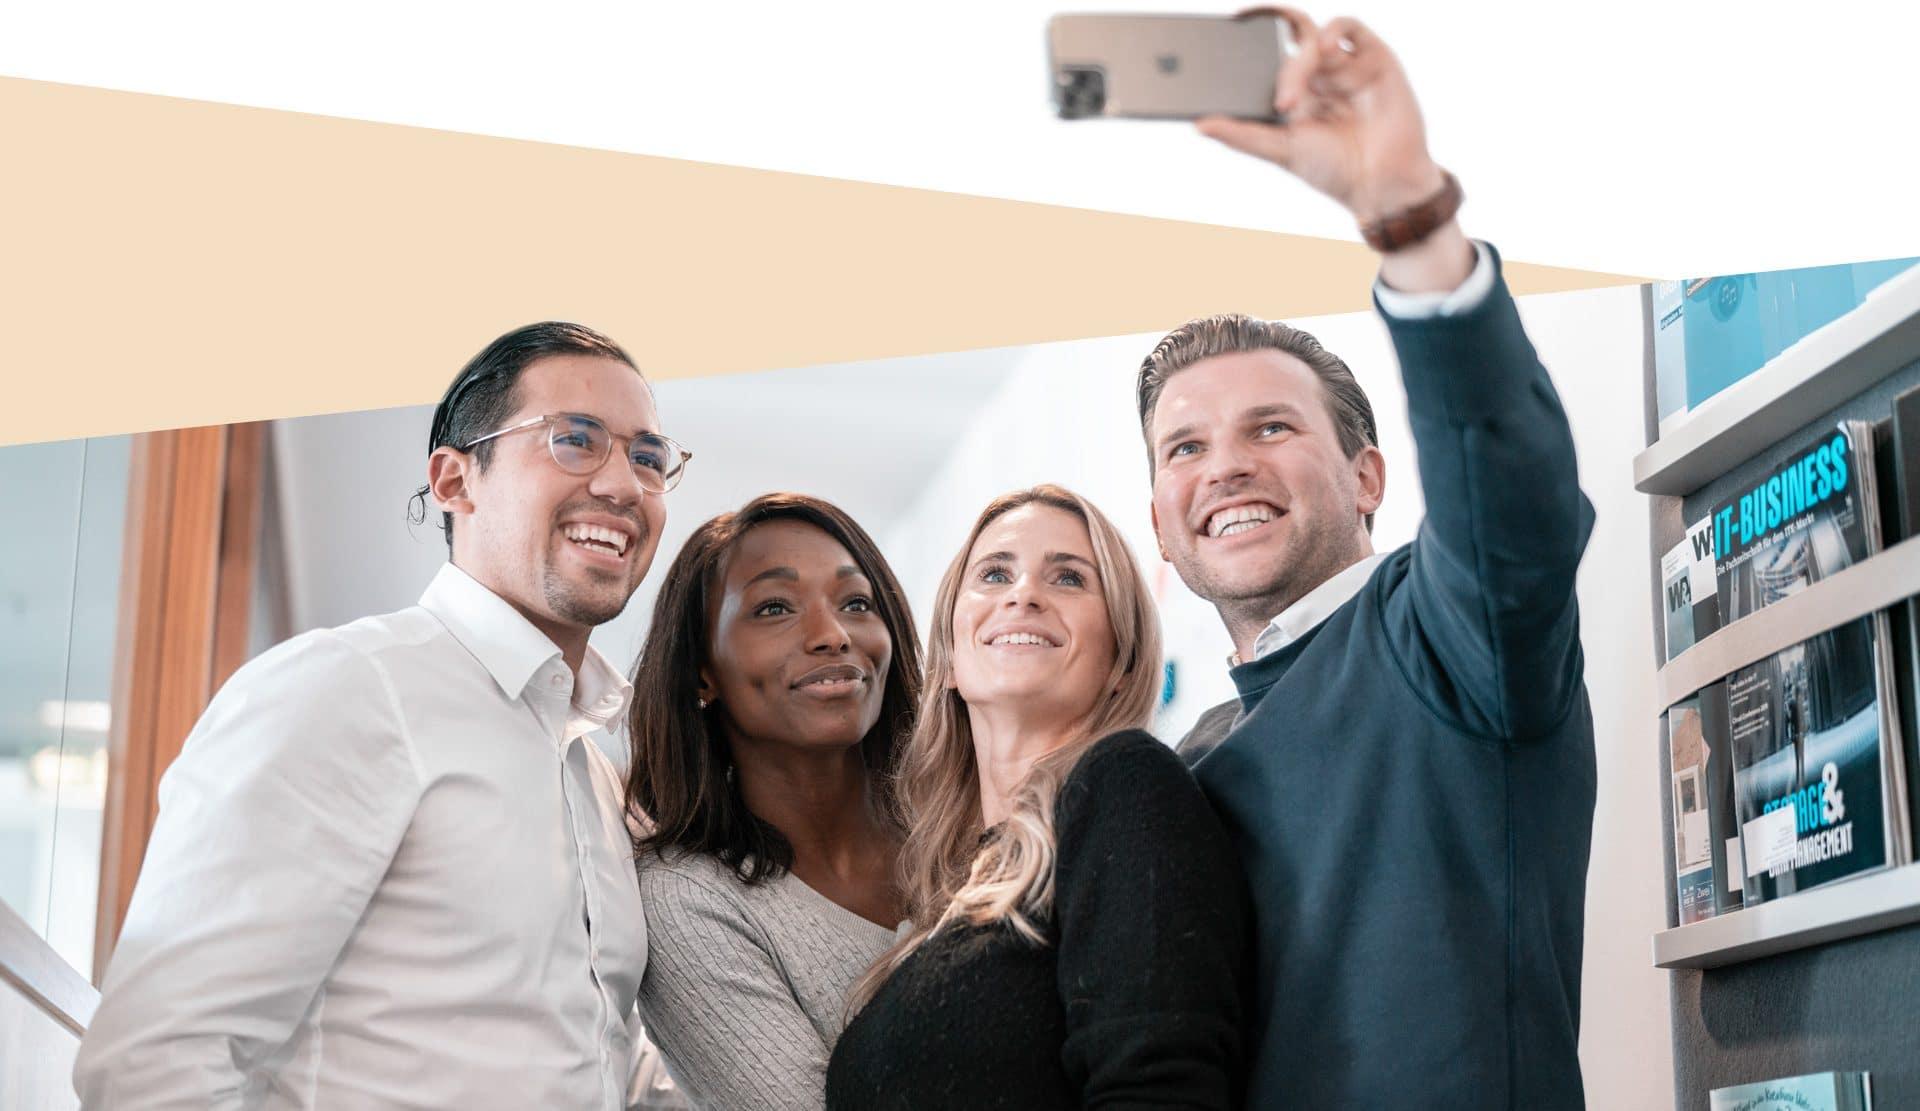 Berater machen Selfie in München